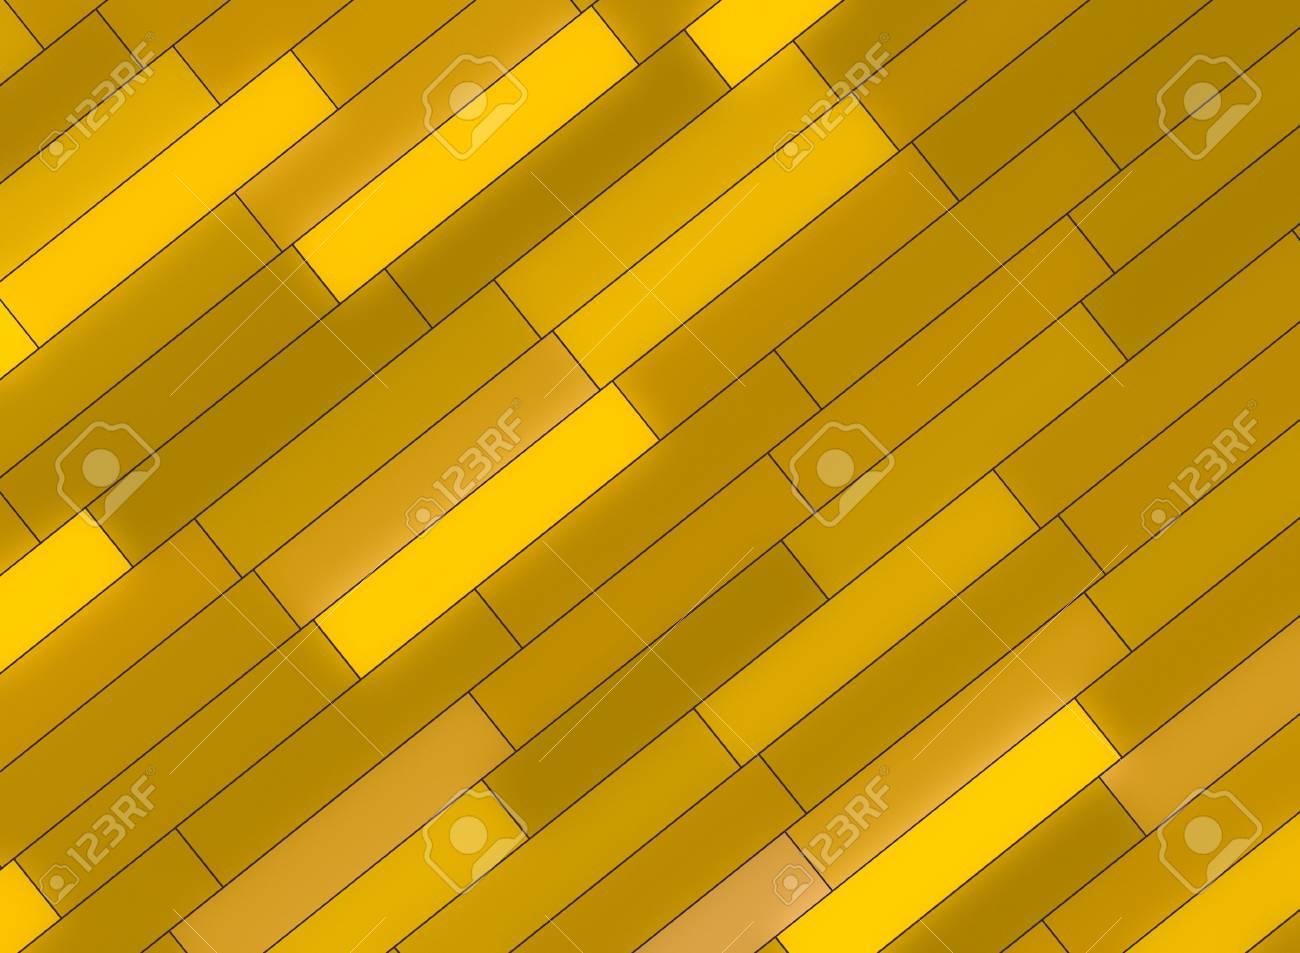 Super Hi Res Flloor Texture Illustration Stock Photo Picture And